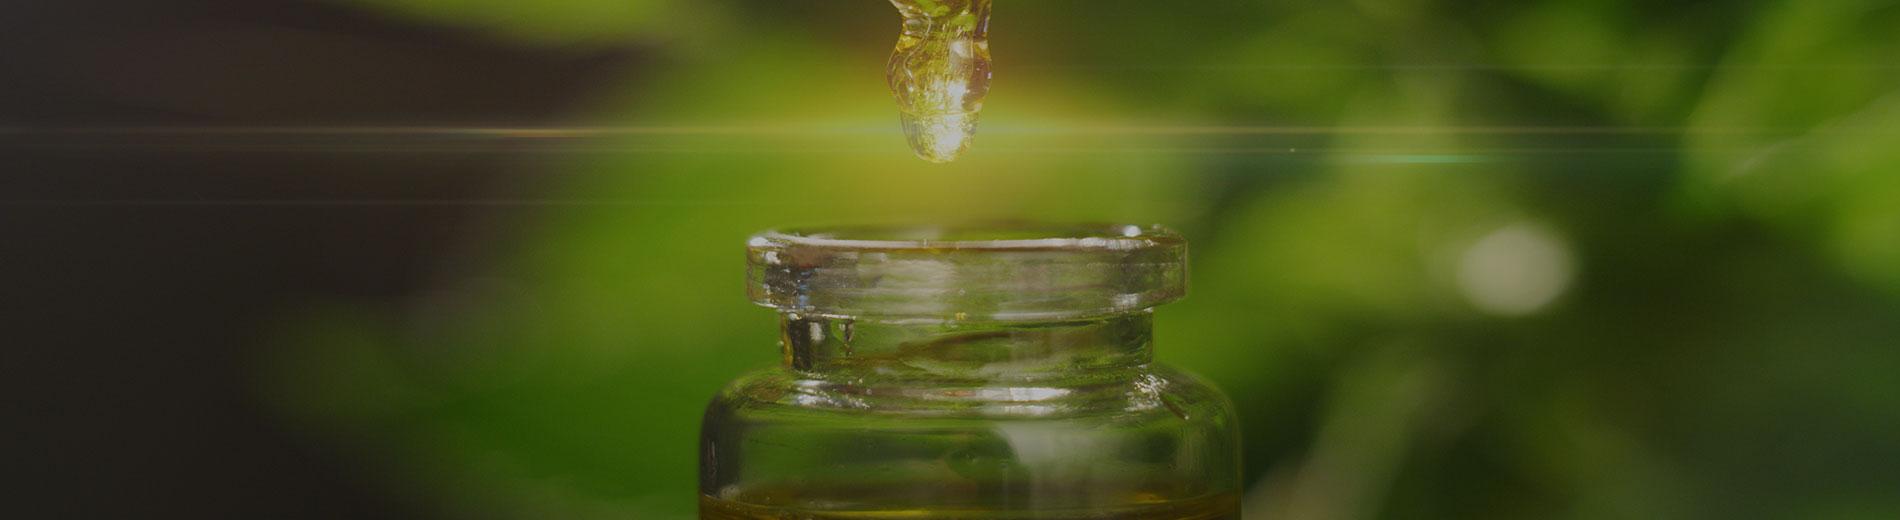 photo shows CBD oil